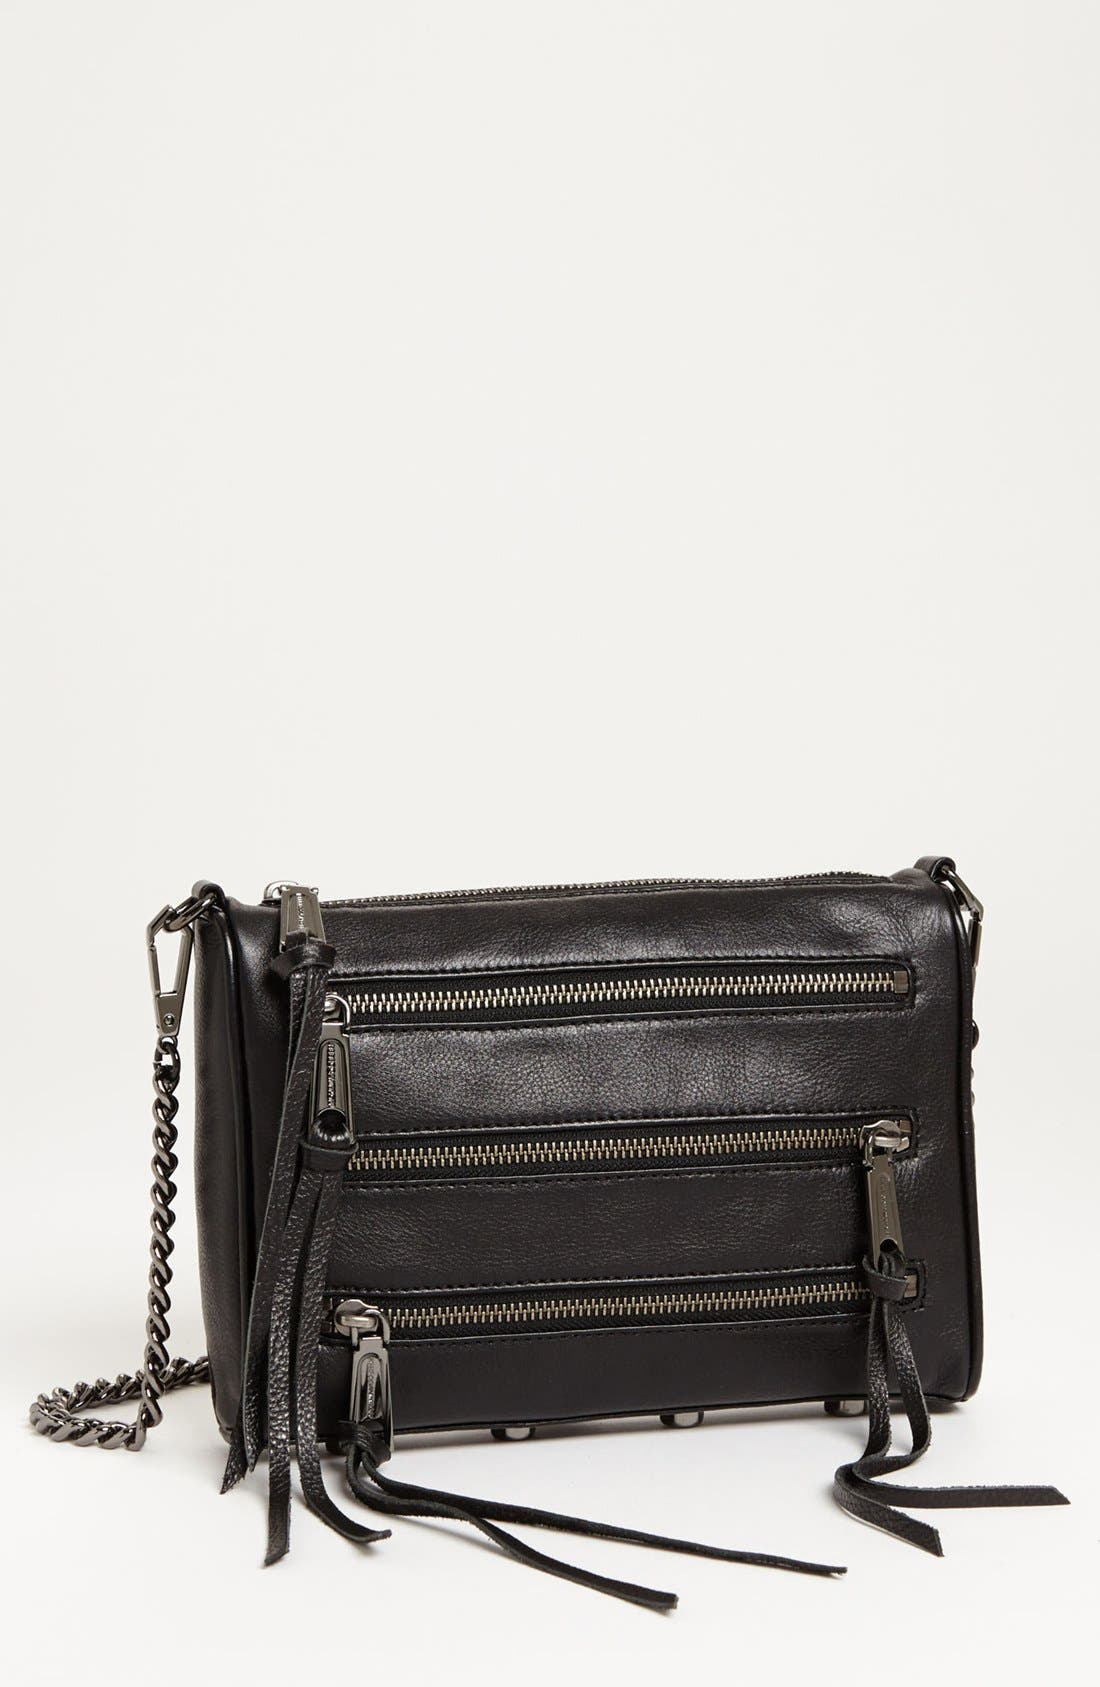 Alternate Image 1 Selected - Rebecca Minkoff '5 Zip - Mini' Crossbody Bag